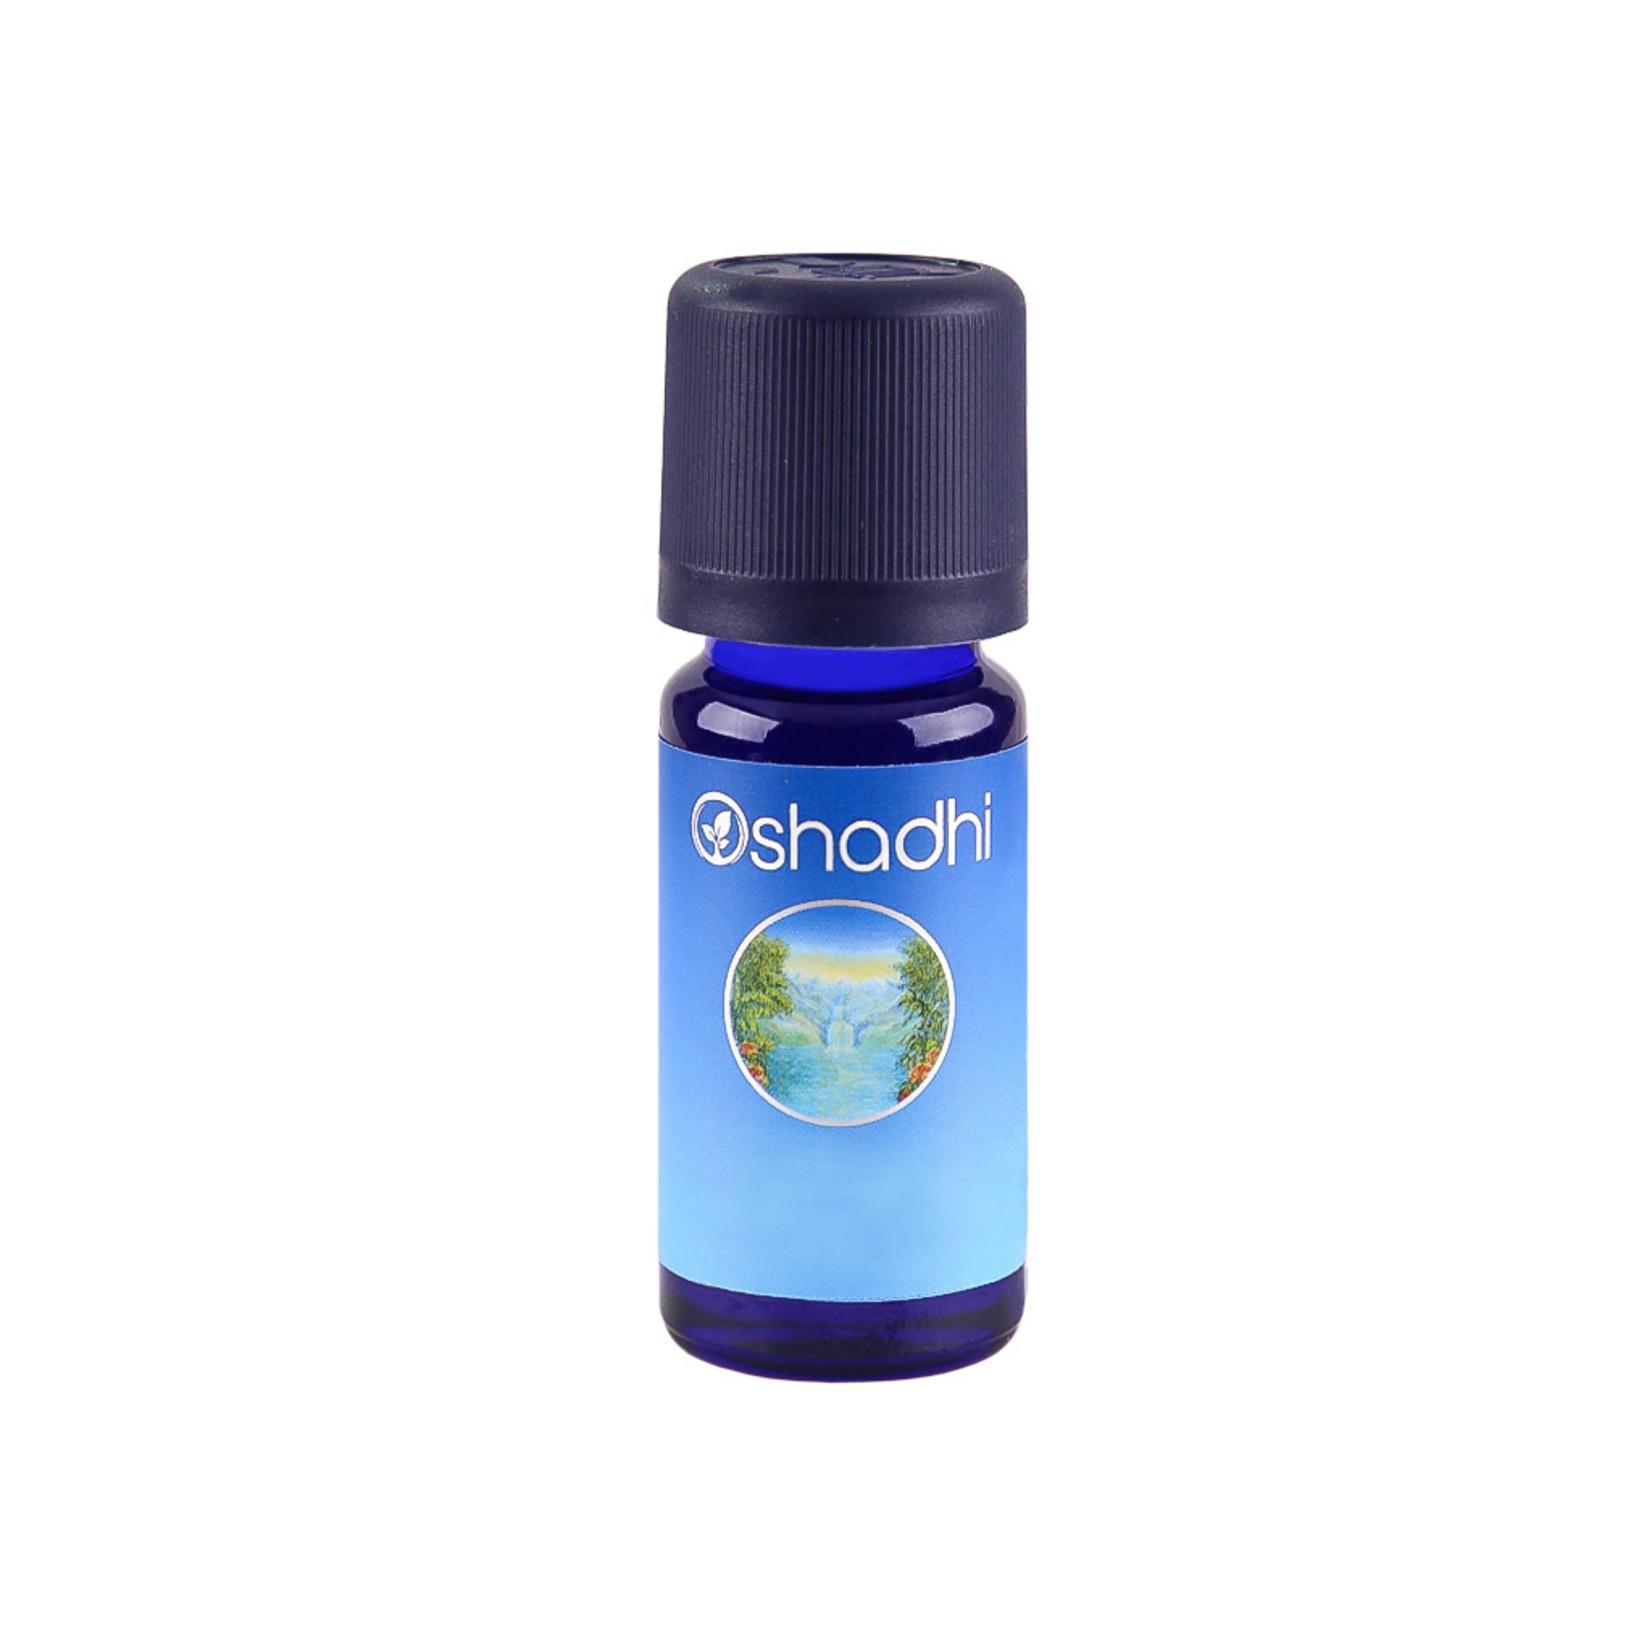 Oshadhi Tea tree Oshadhi - schimmelwerend en anti-bacterieel - 10ml